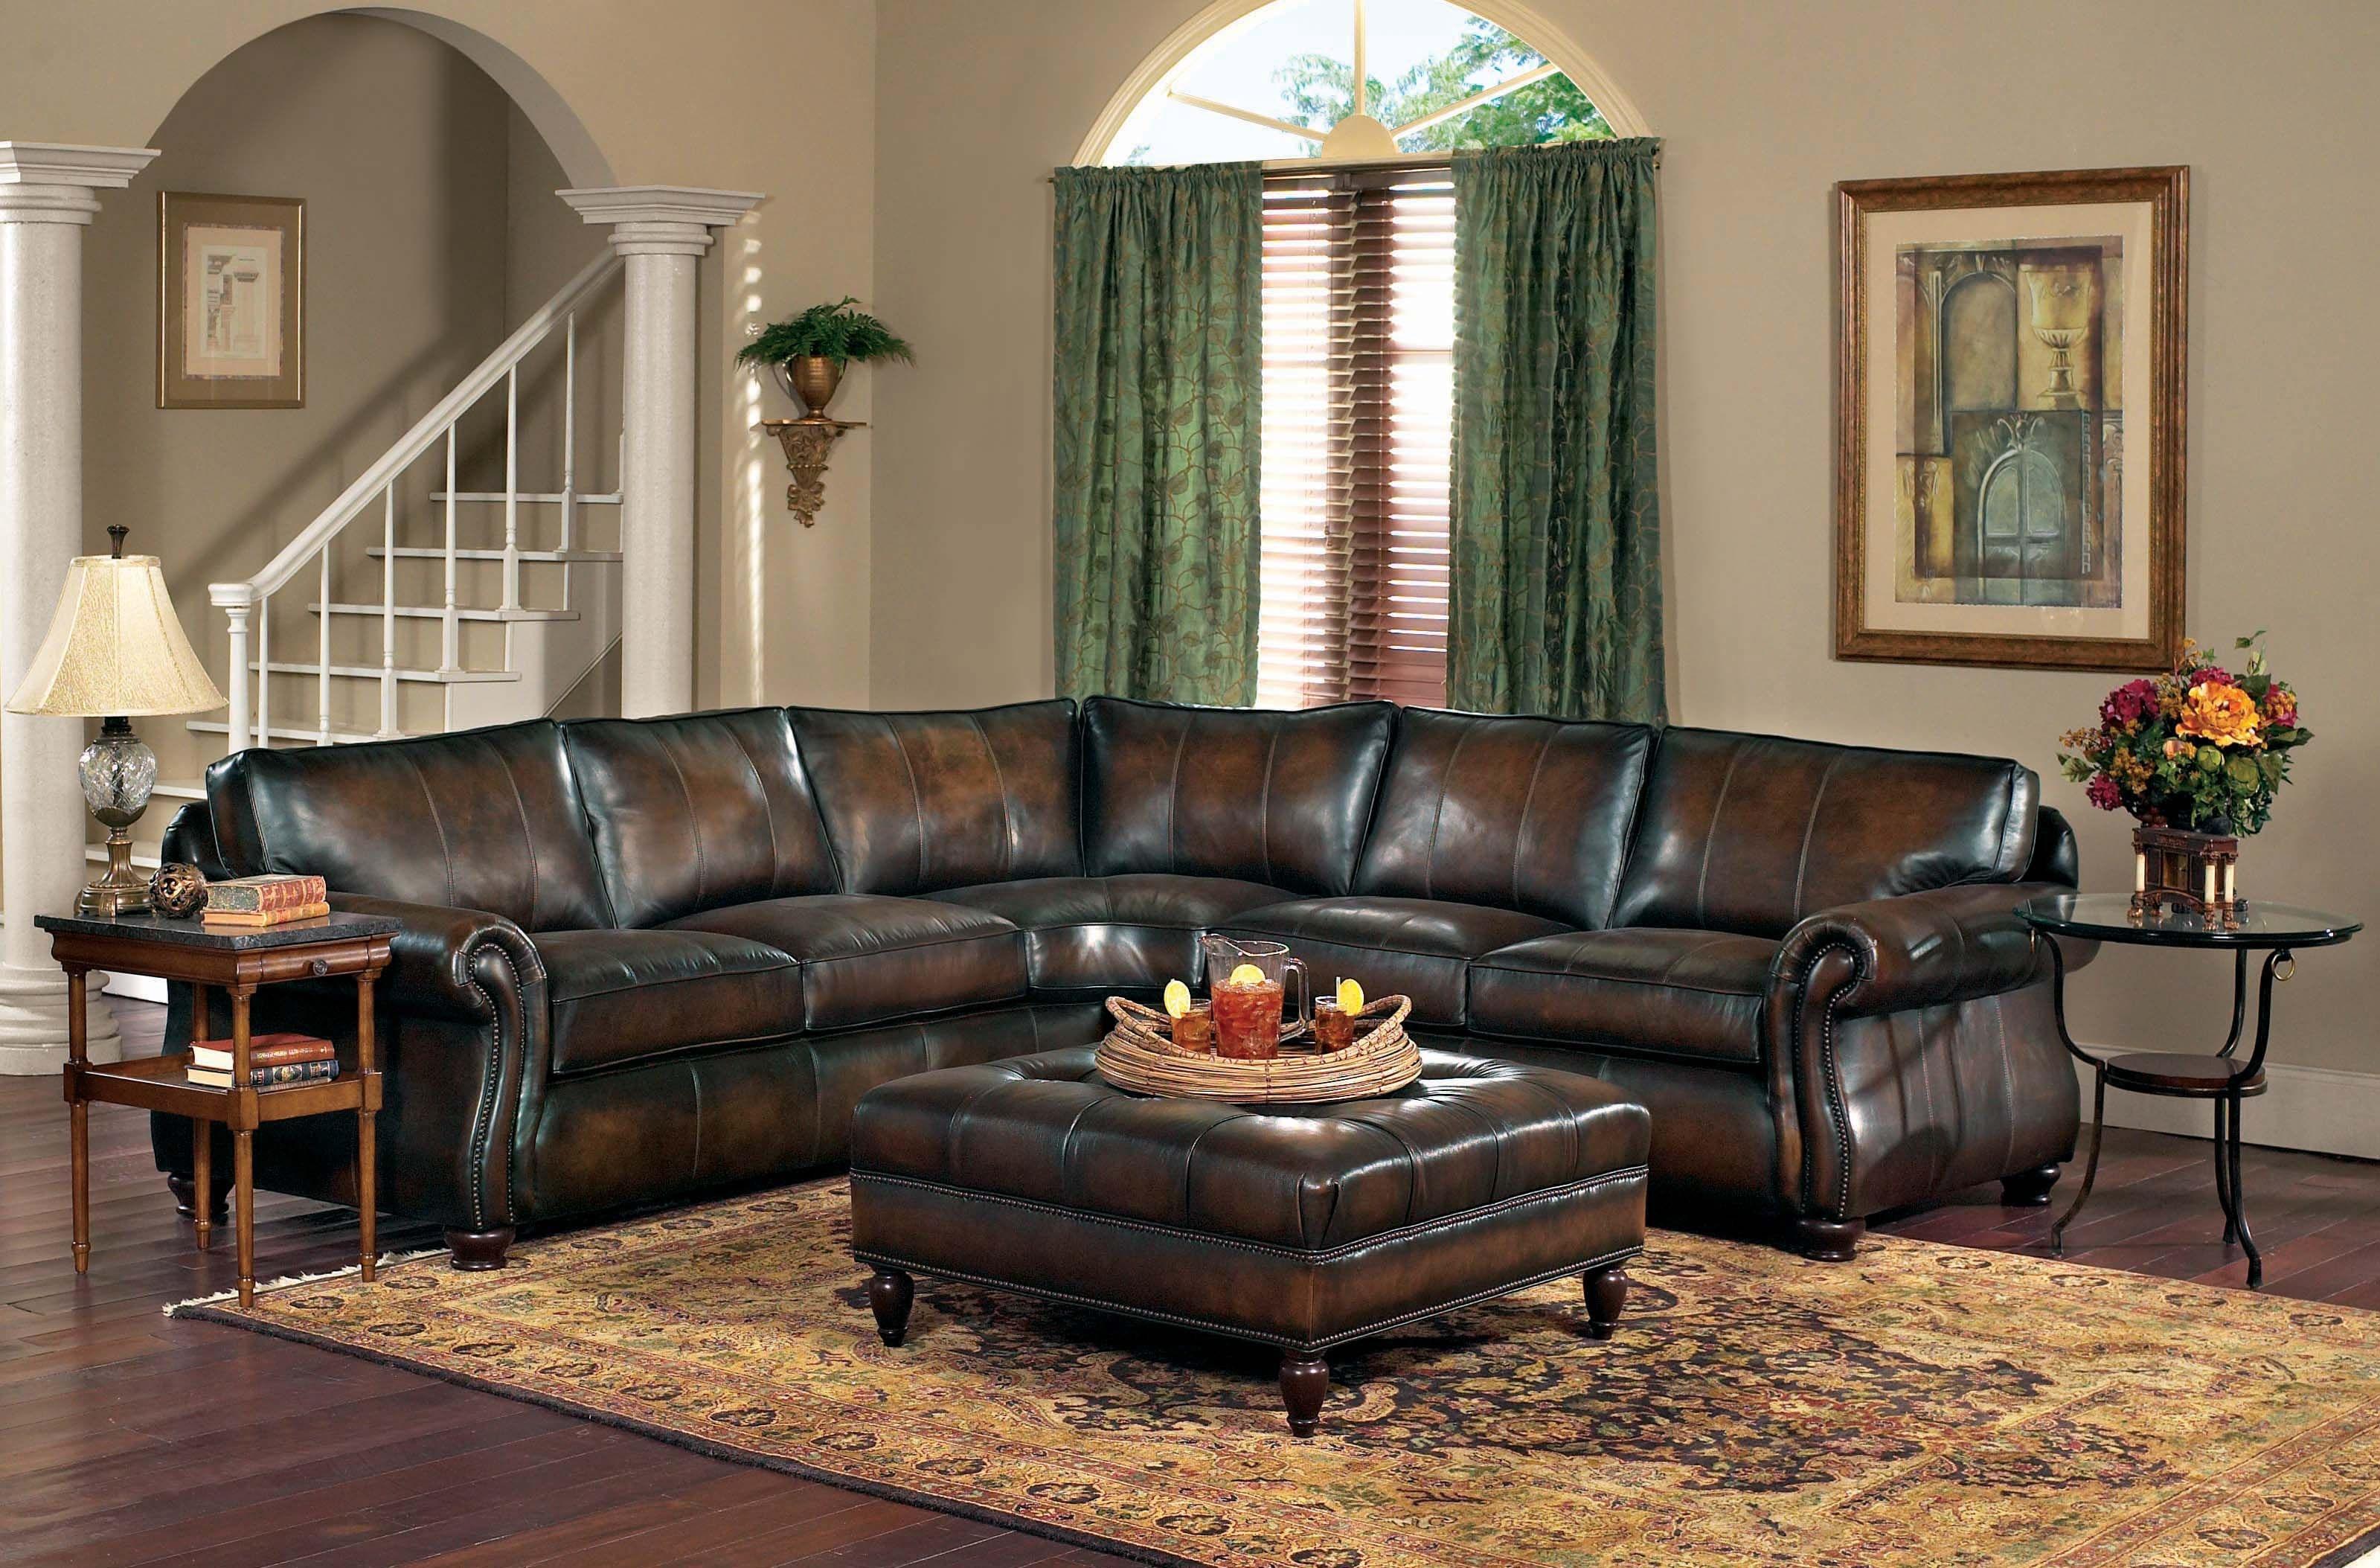 bernhardt london club leather sofa price next brompton living room van gogh 100 2 piece sectional